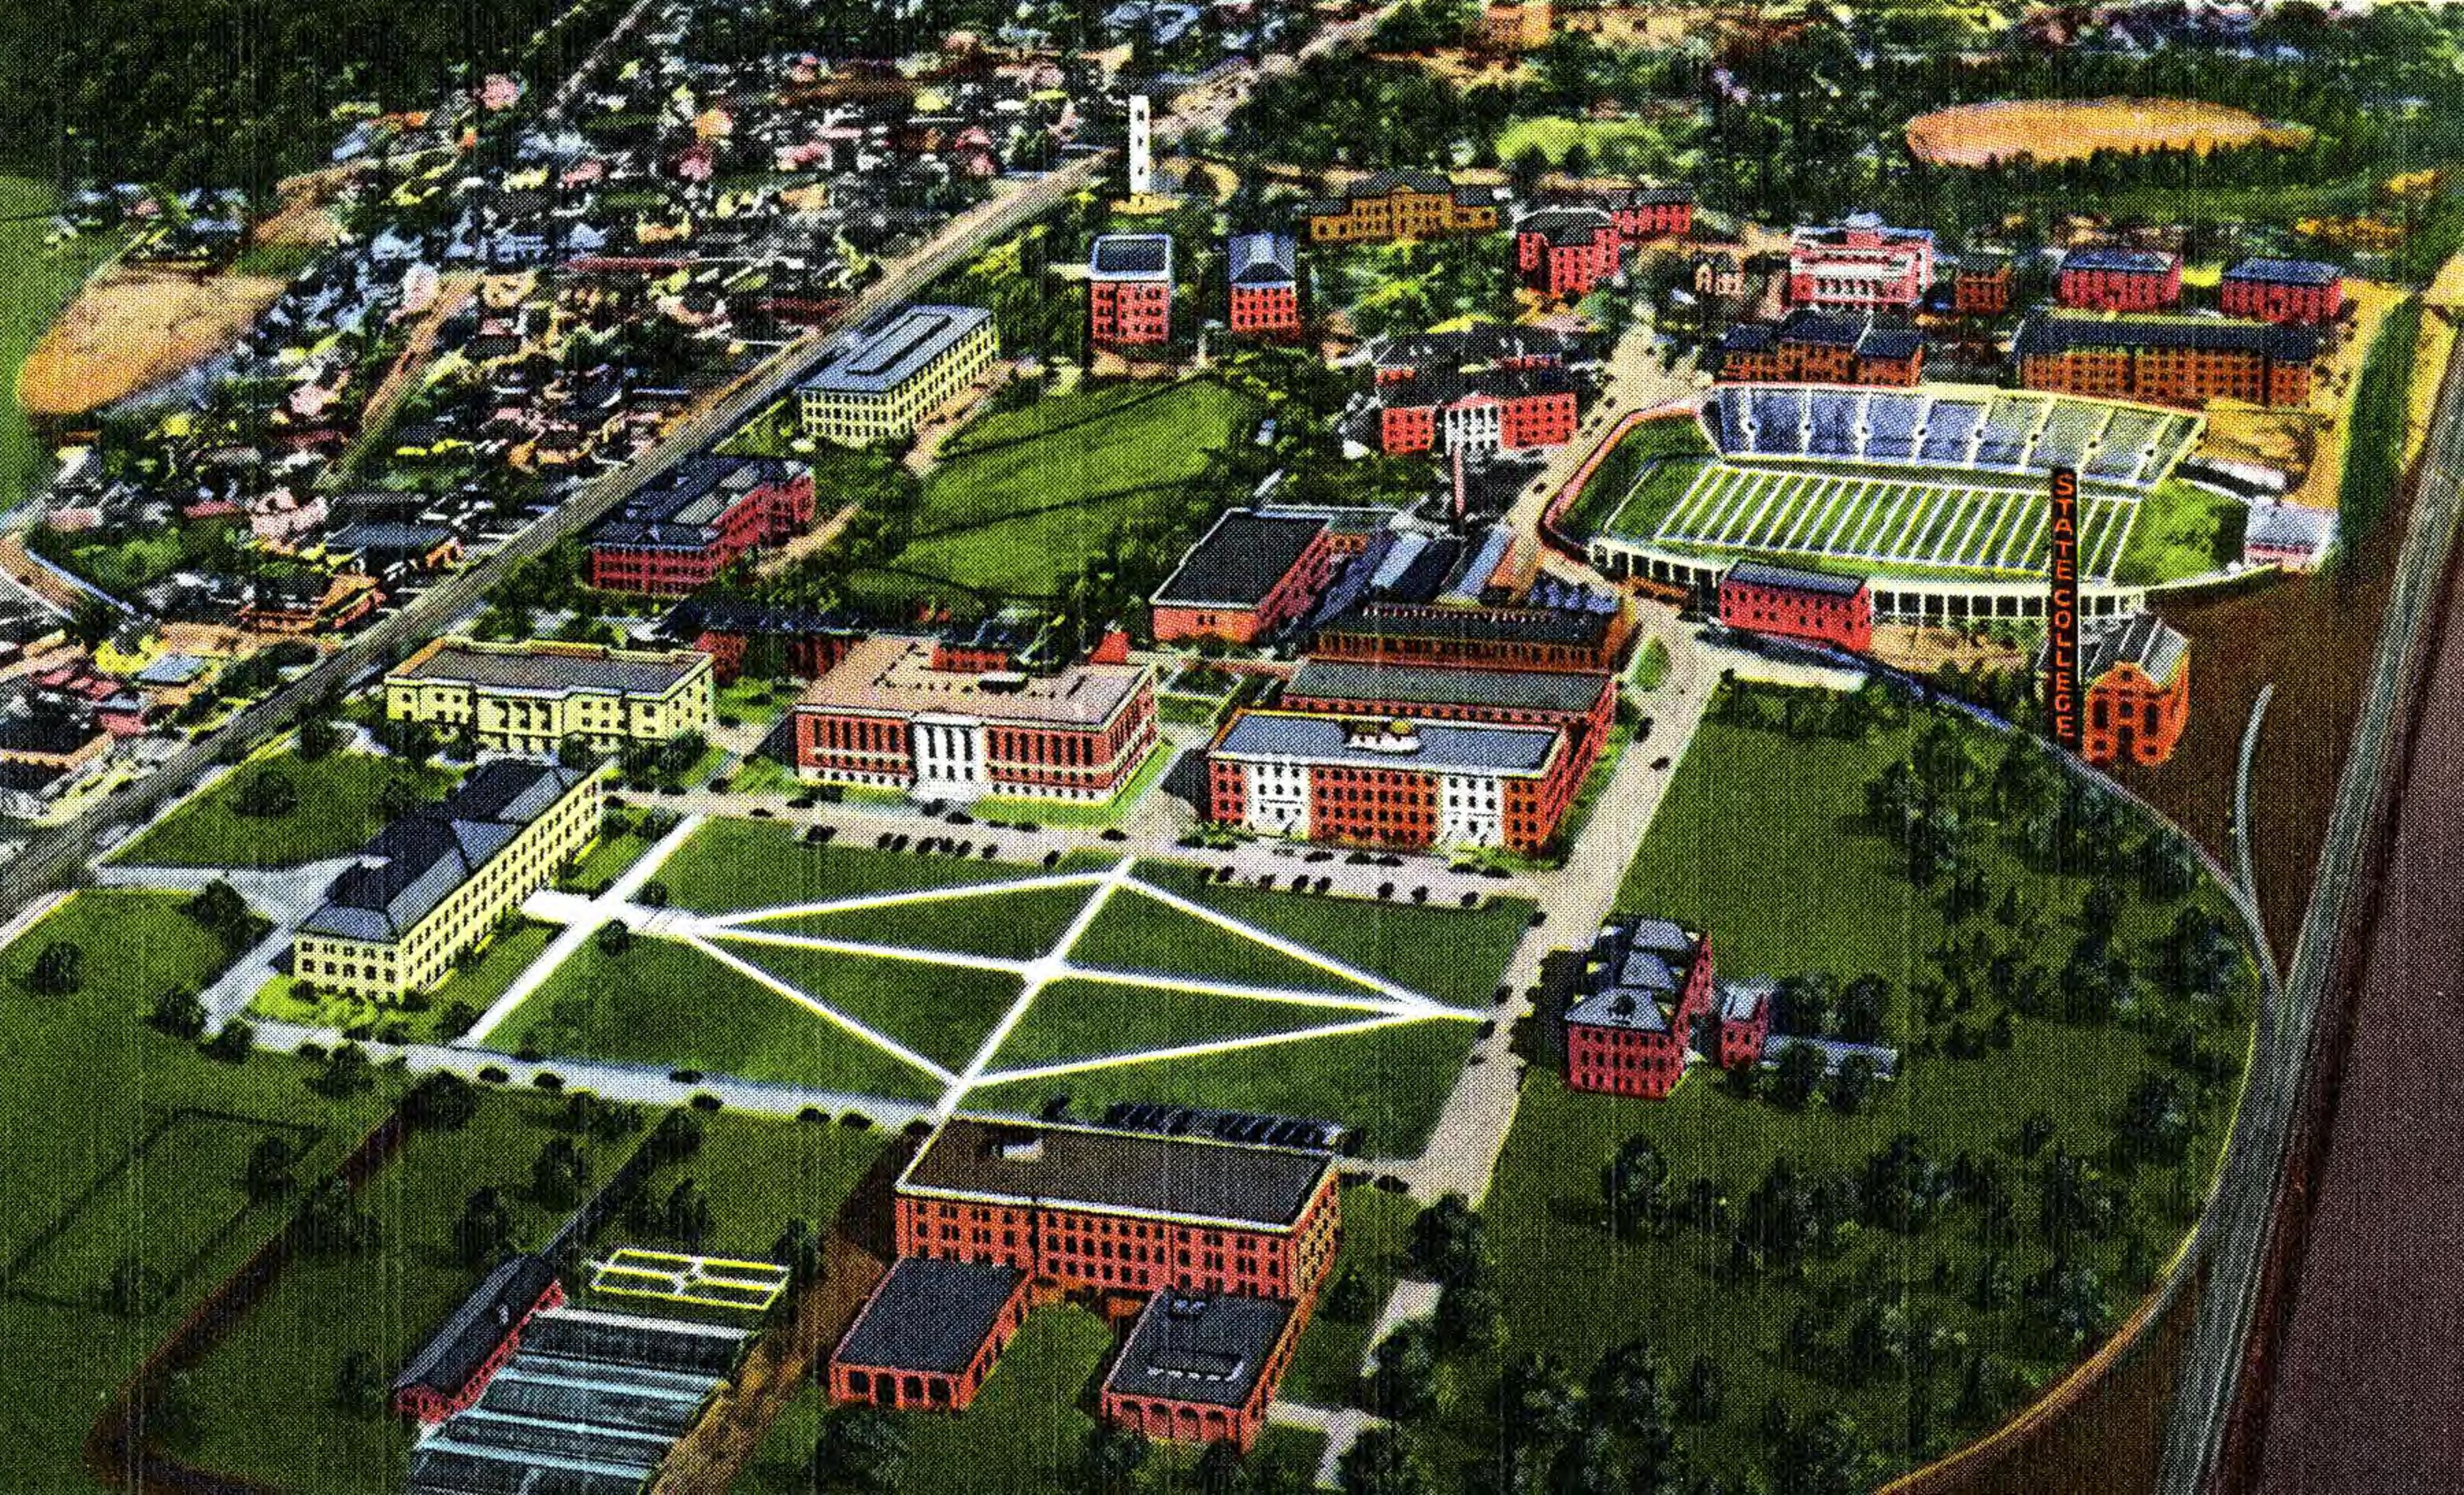 Ncsu libraries north carolina state university html autos post